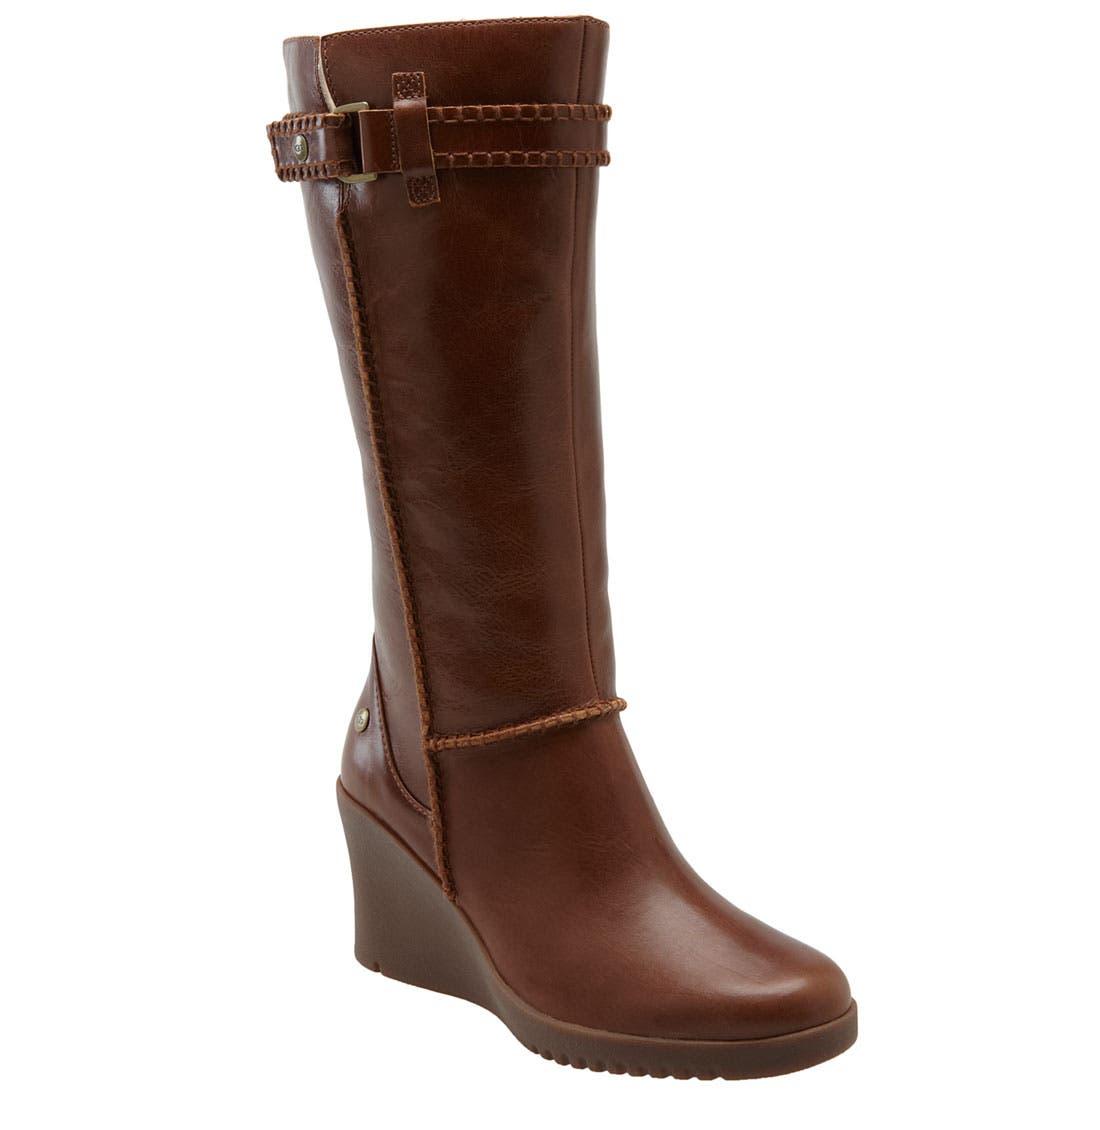 Alternate Image 1 Selected - UGG® Australia 'Maxene' Wedge Boot (Women)